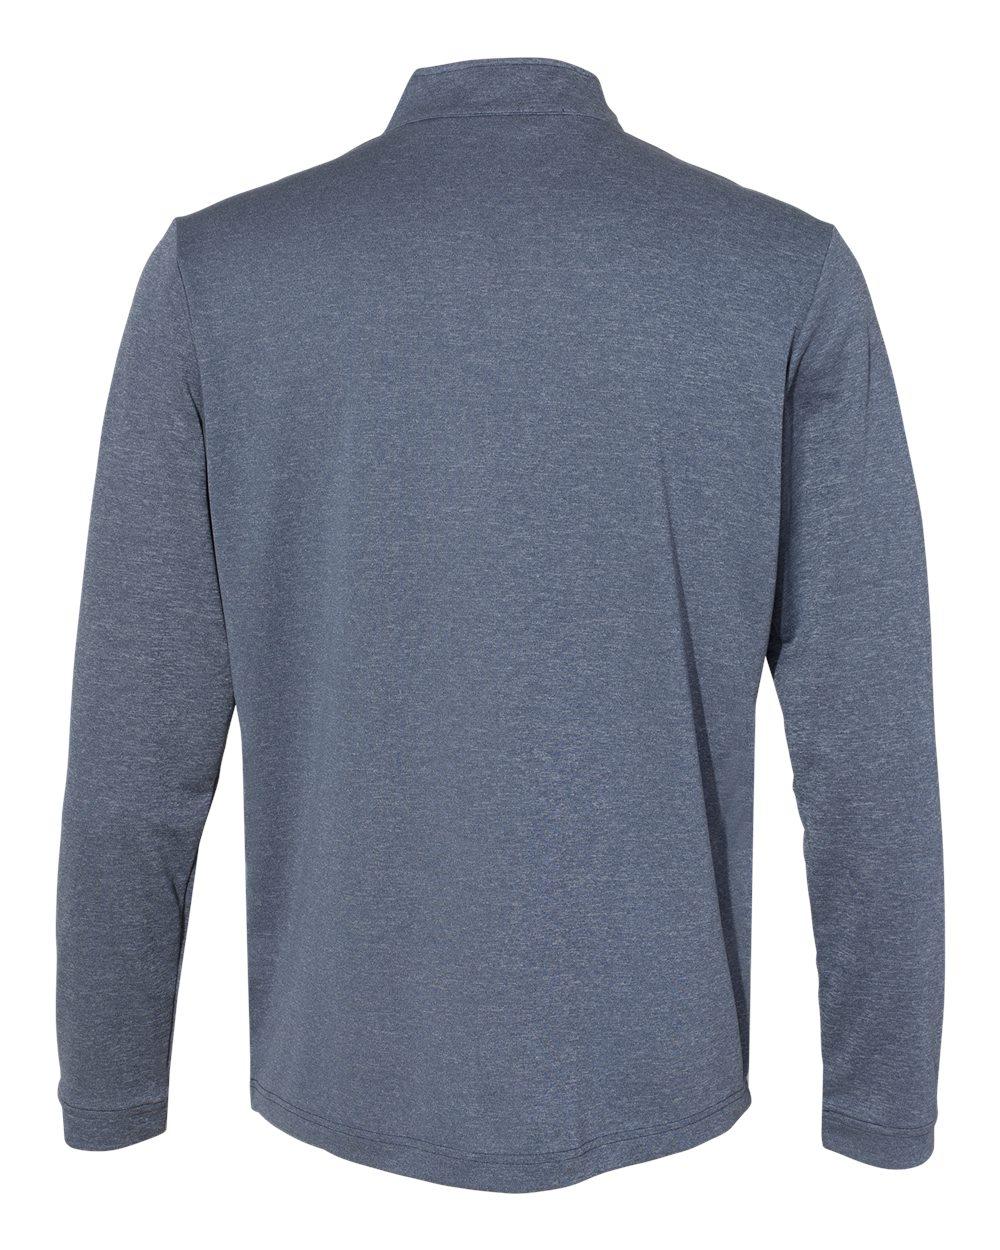 Adidas-Mens-Lightweight-UPF-pullover-Shirt-Warmup-A280-up-to-4XL thumbnail 10